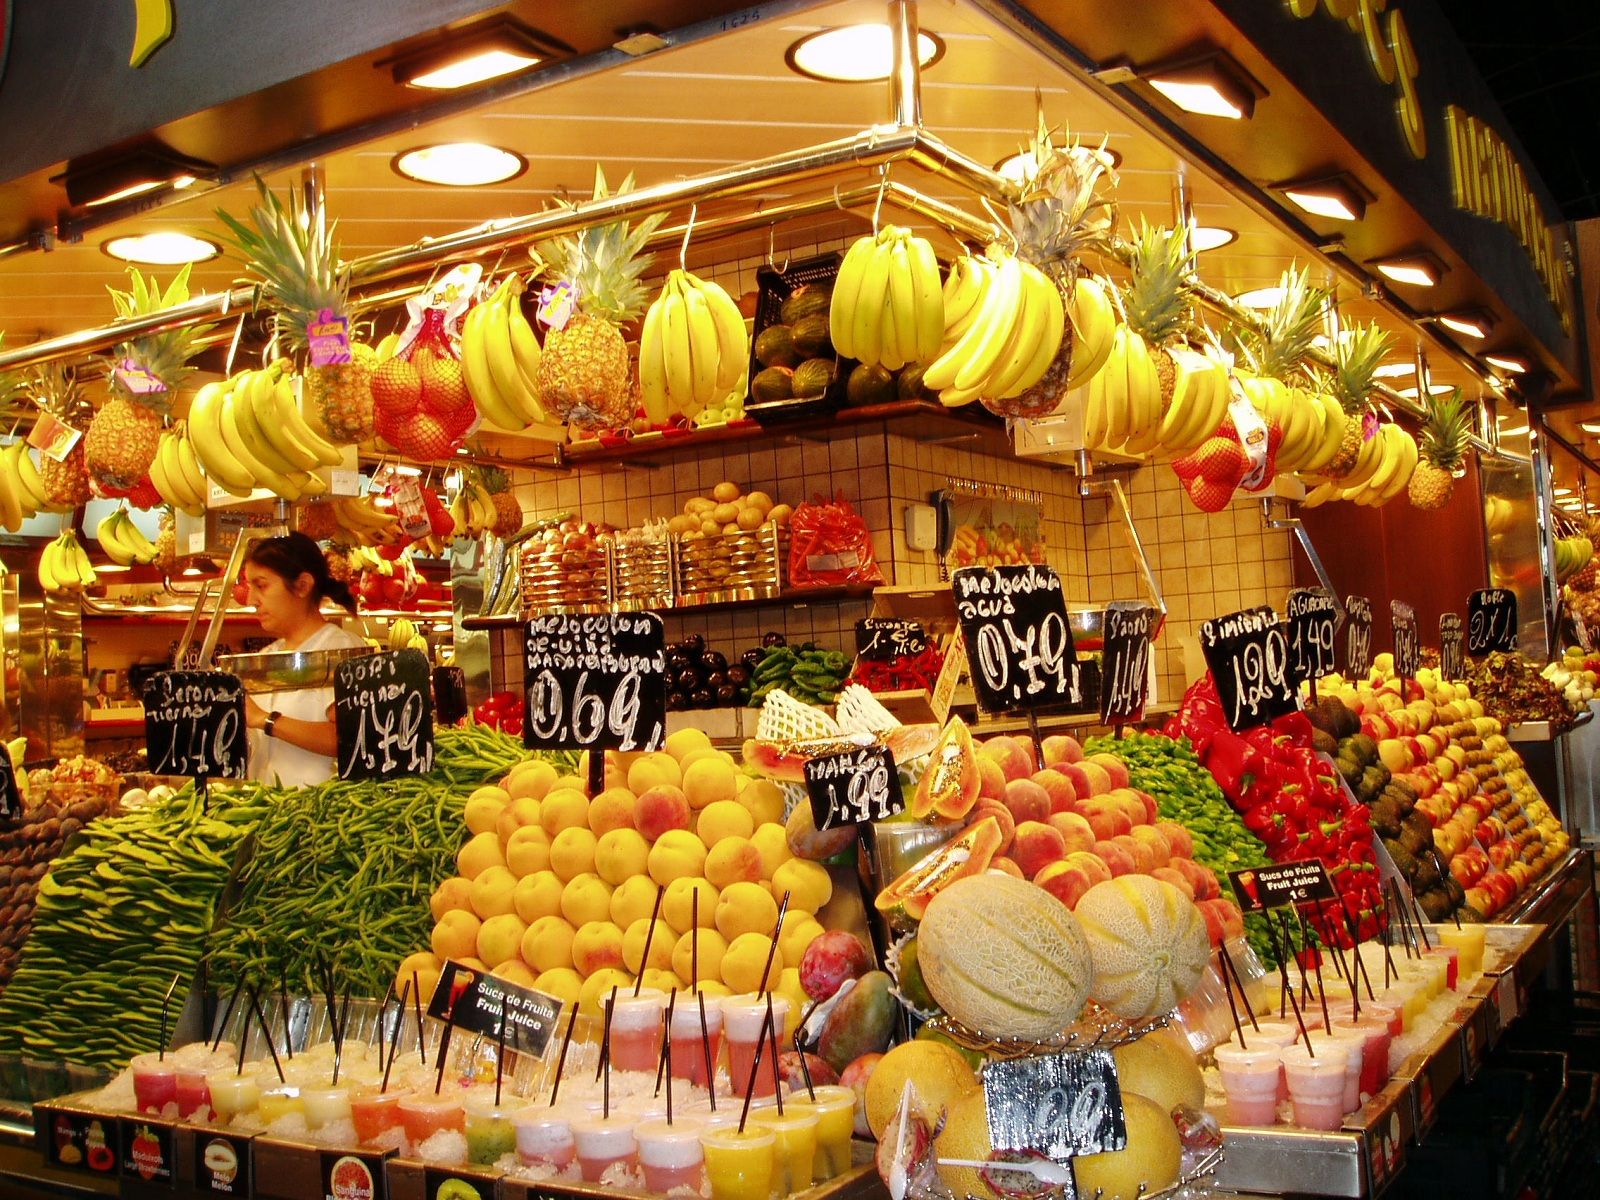 Barcelona Food Market La Boqueria